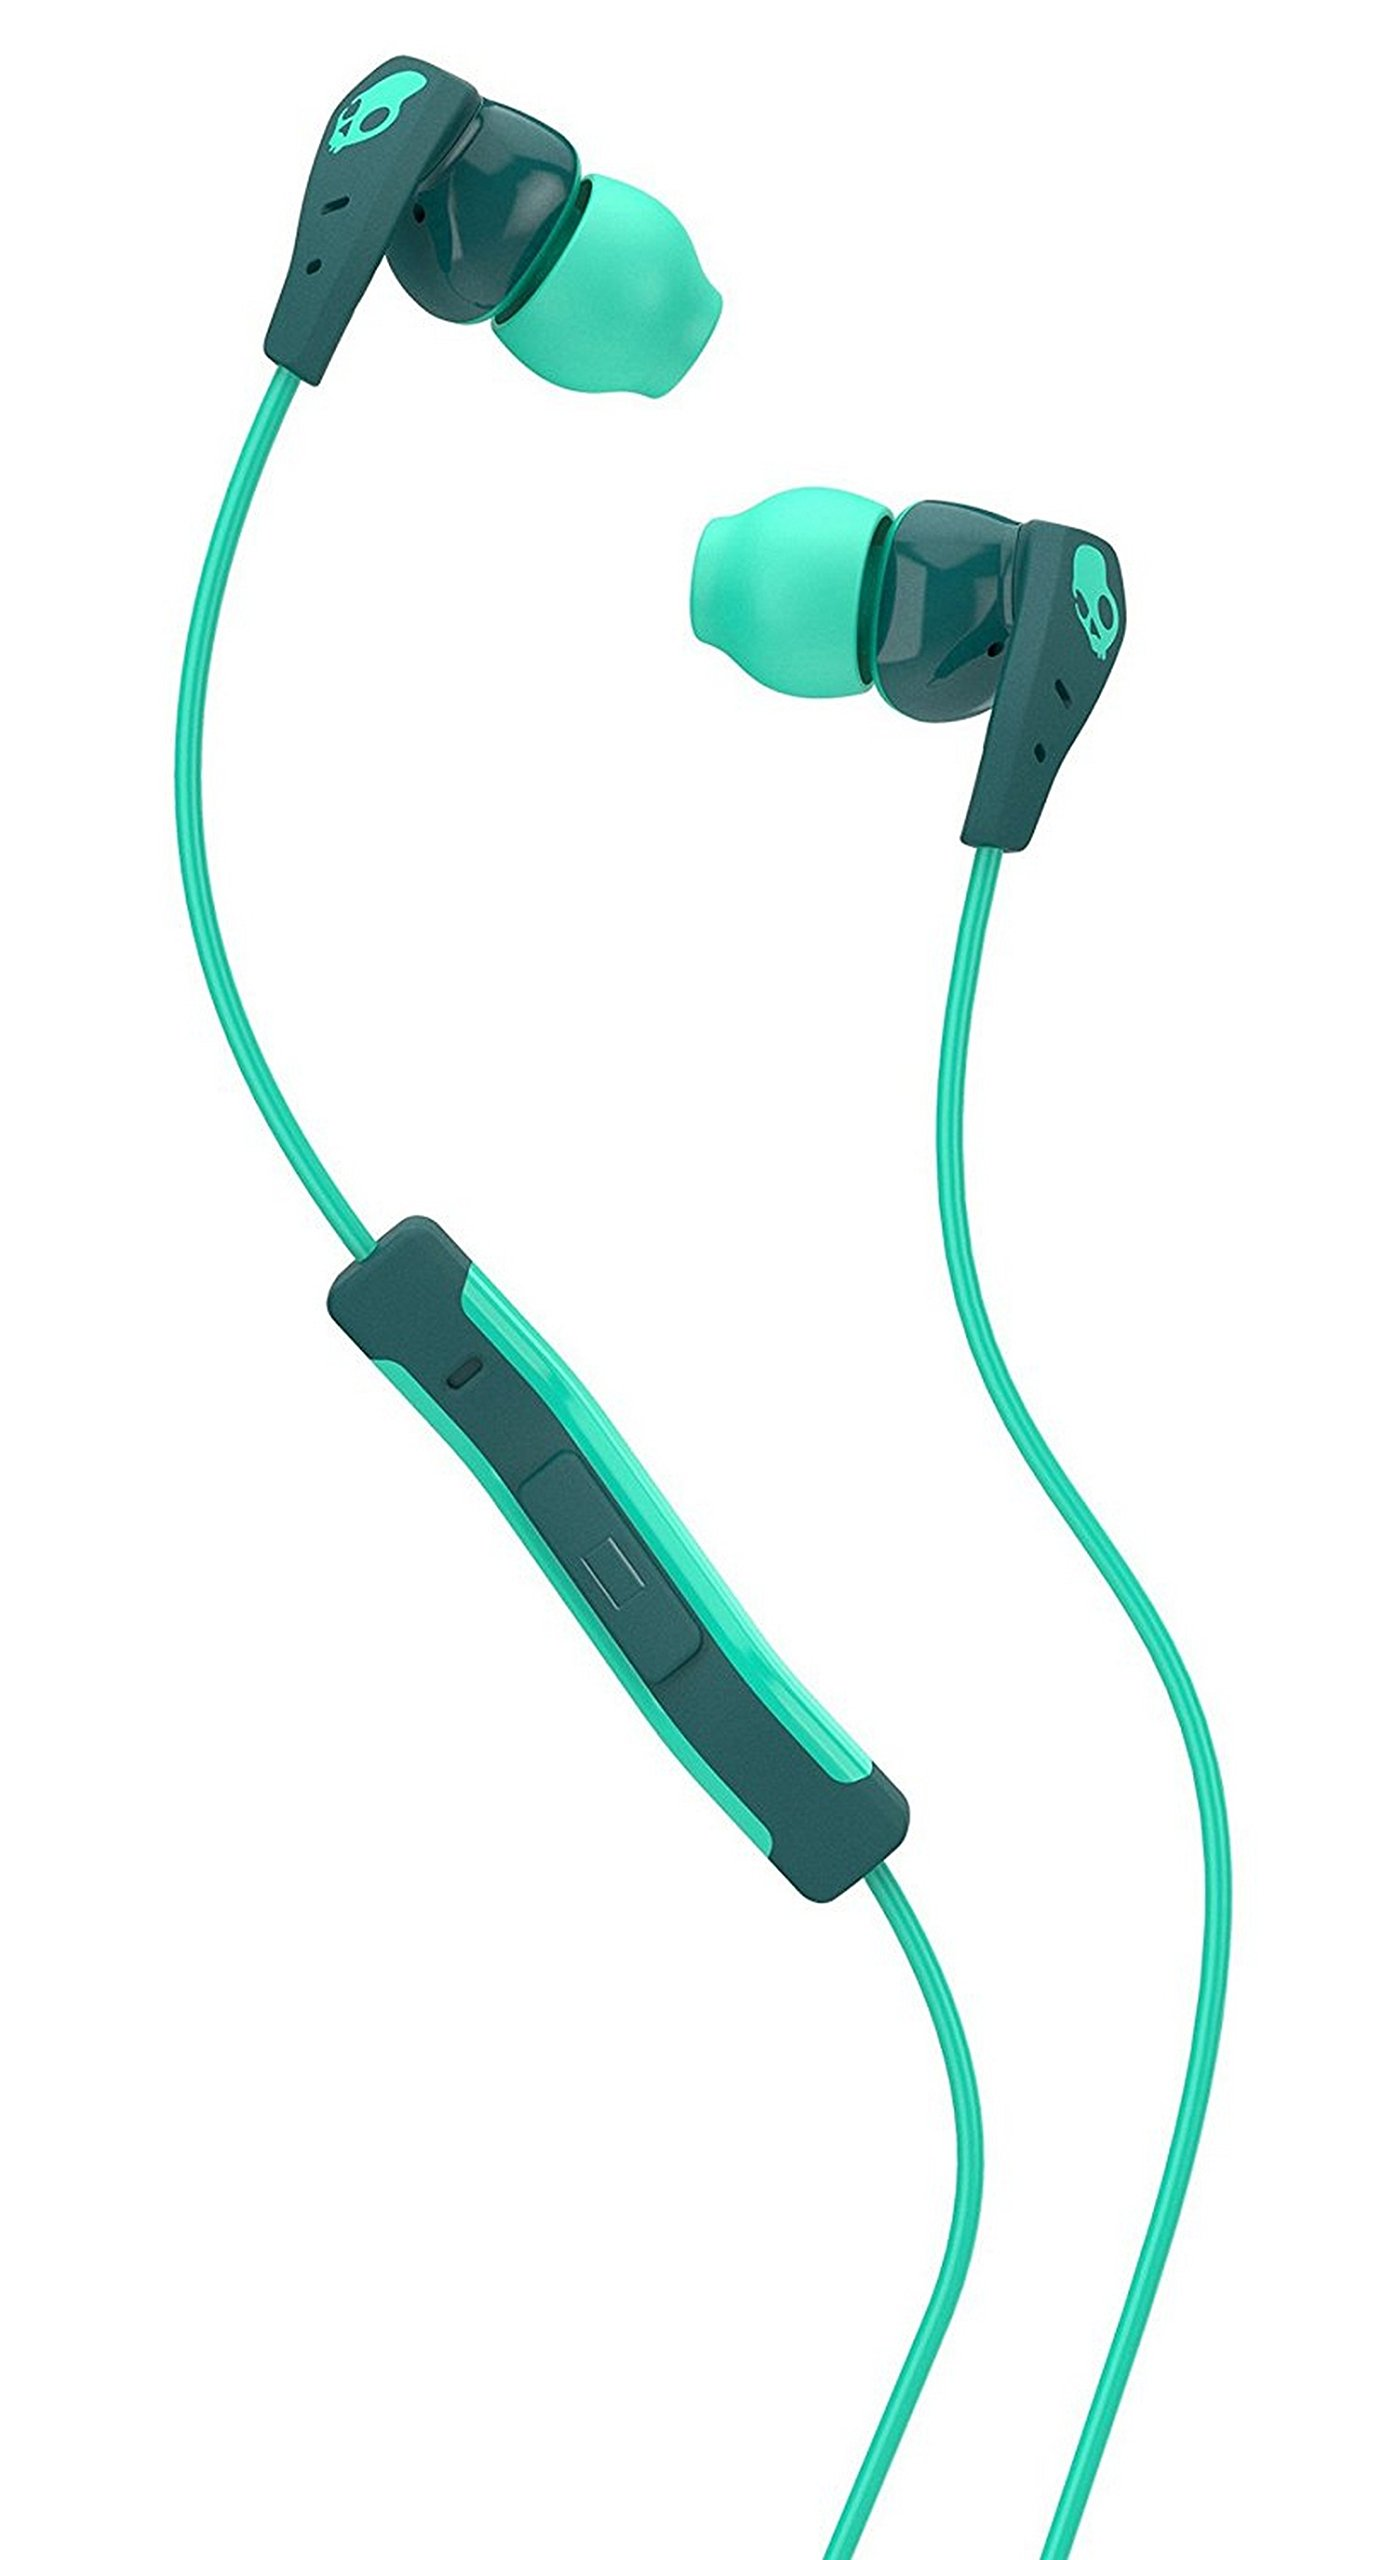 Skullcandy Method In-Ear Sweat Resistant Sports Earbud, Teal/Green by Skullcandy